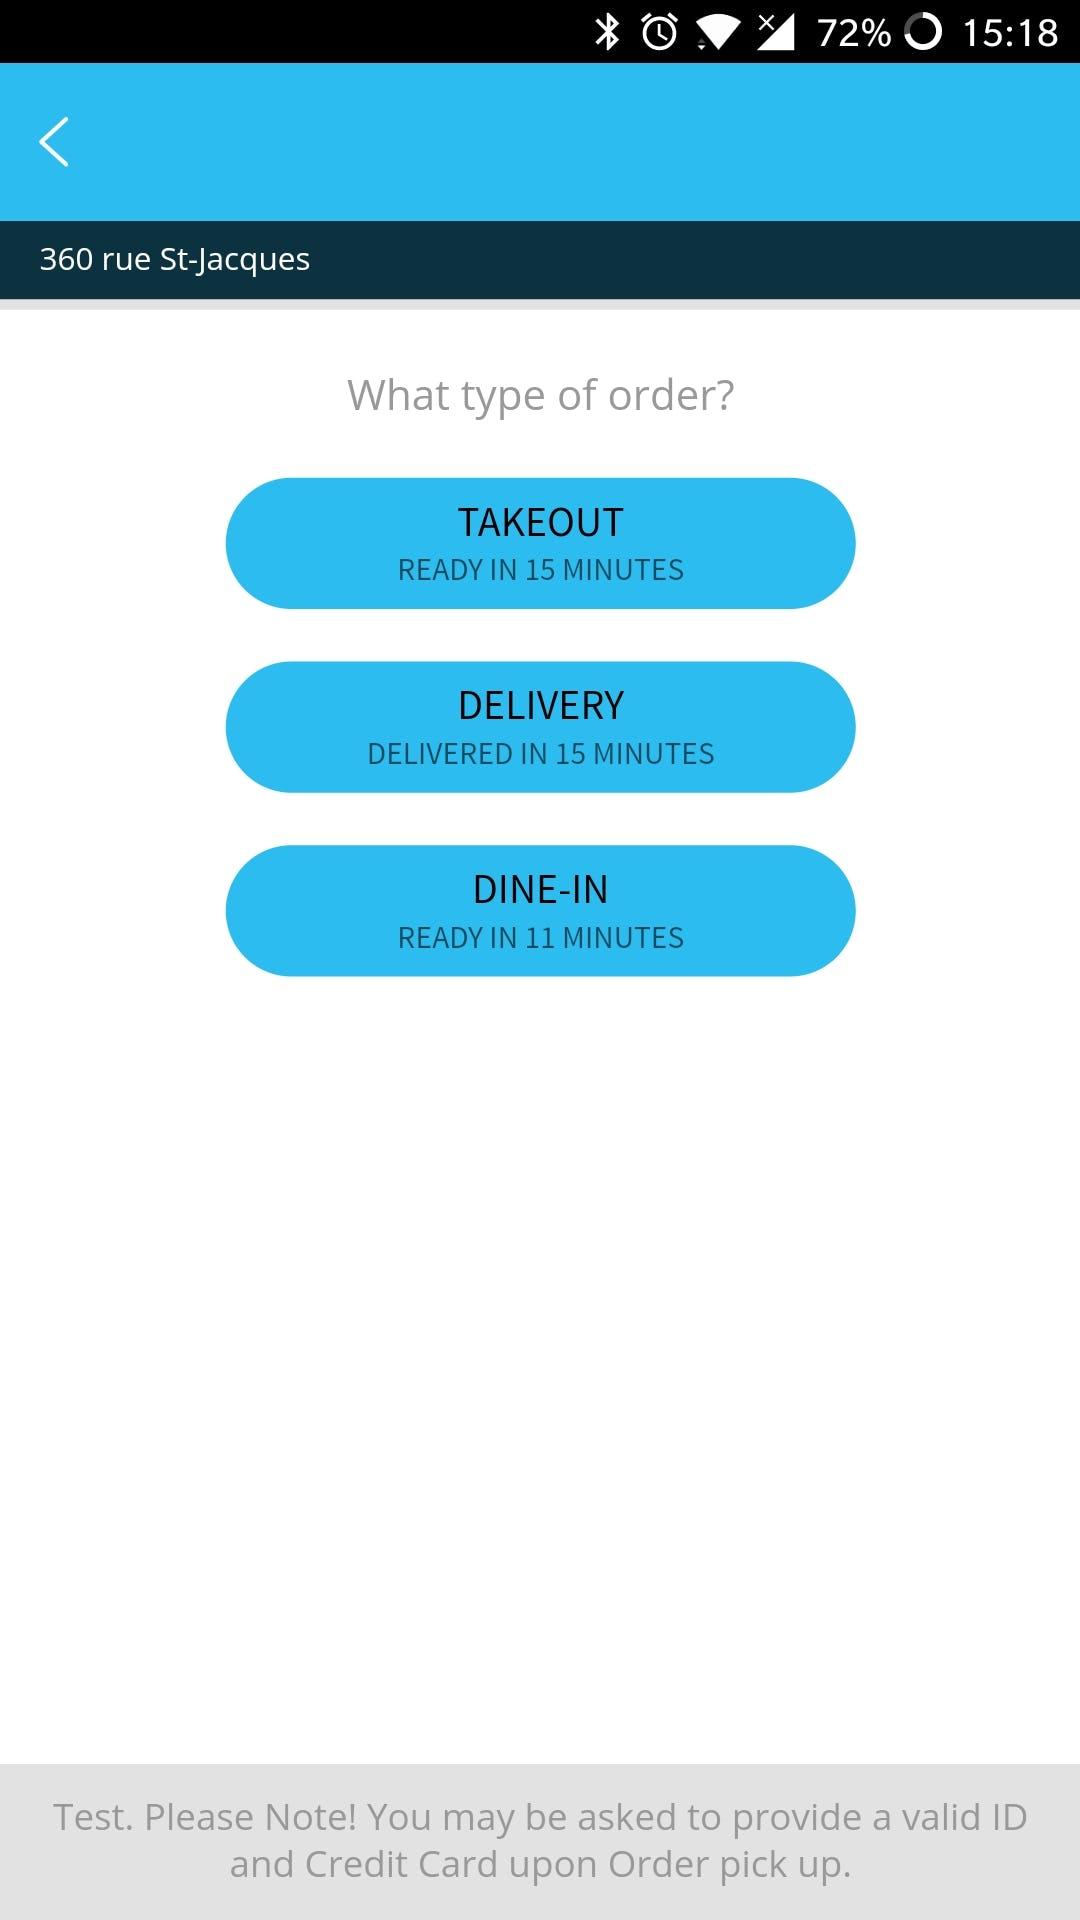 MYR POS Software - Mobile ordering application